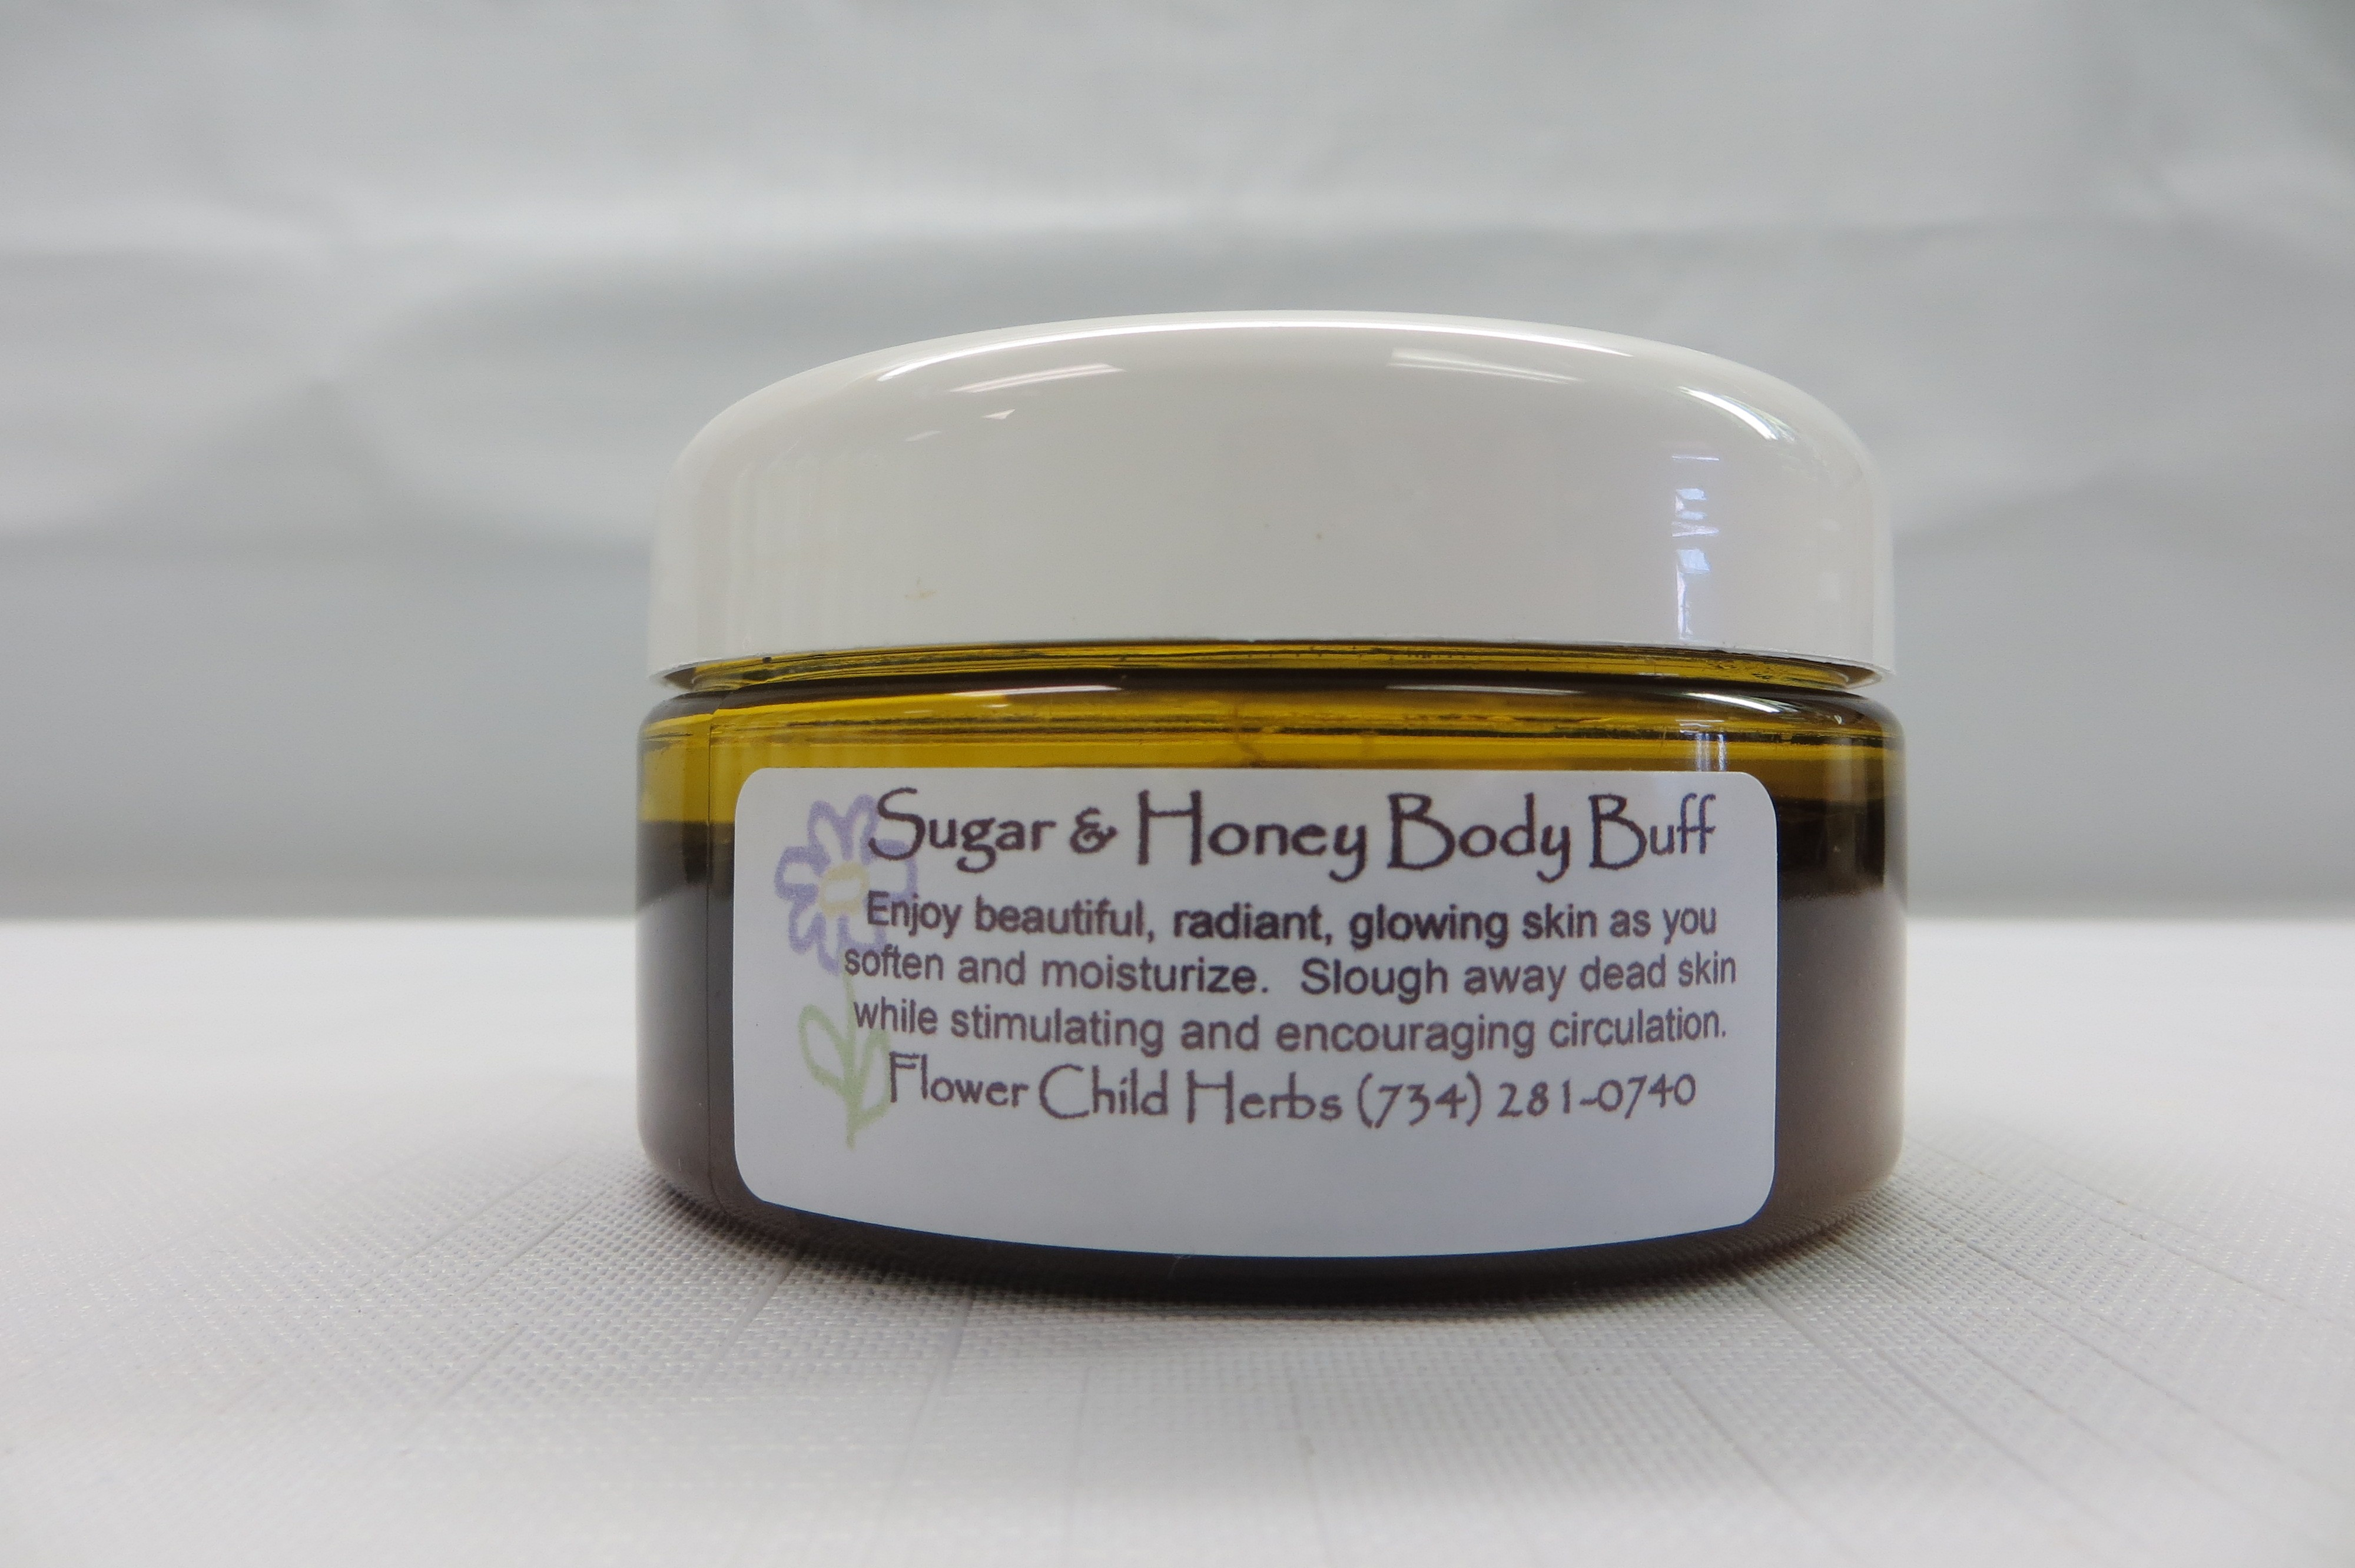 Chocolate Sugar and Honey Body Buff